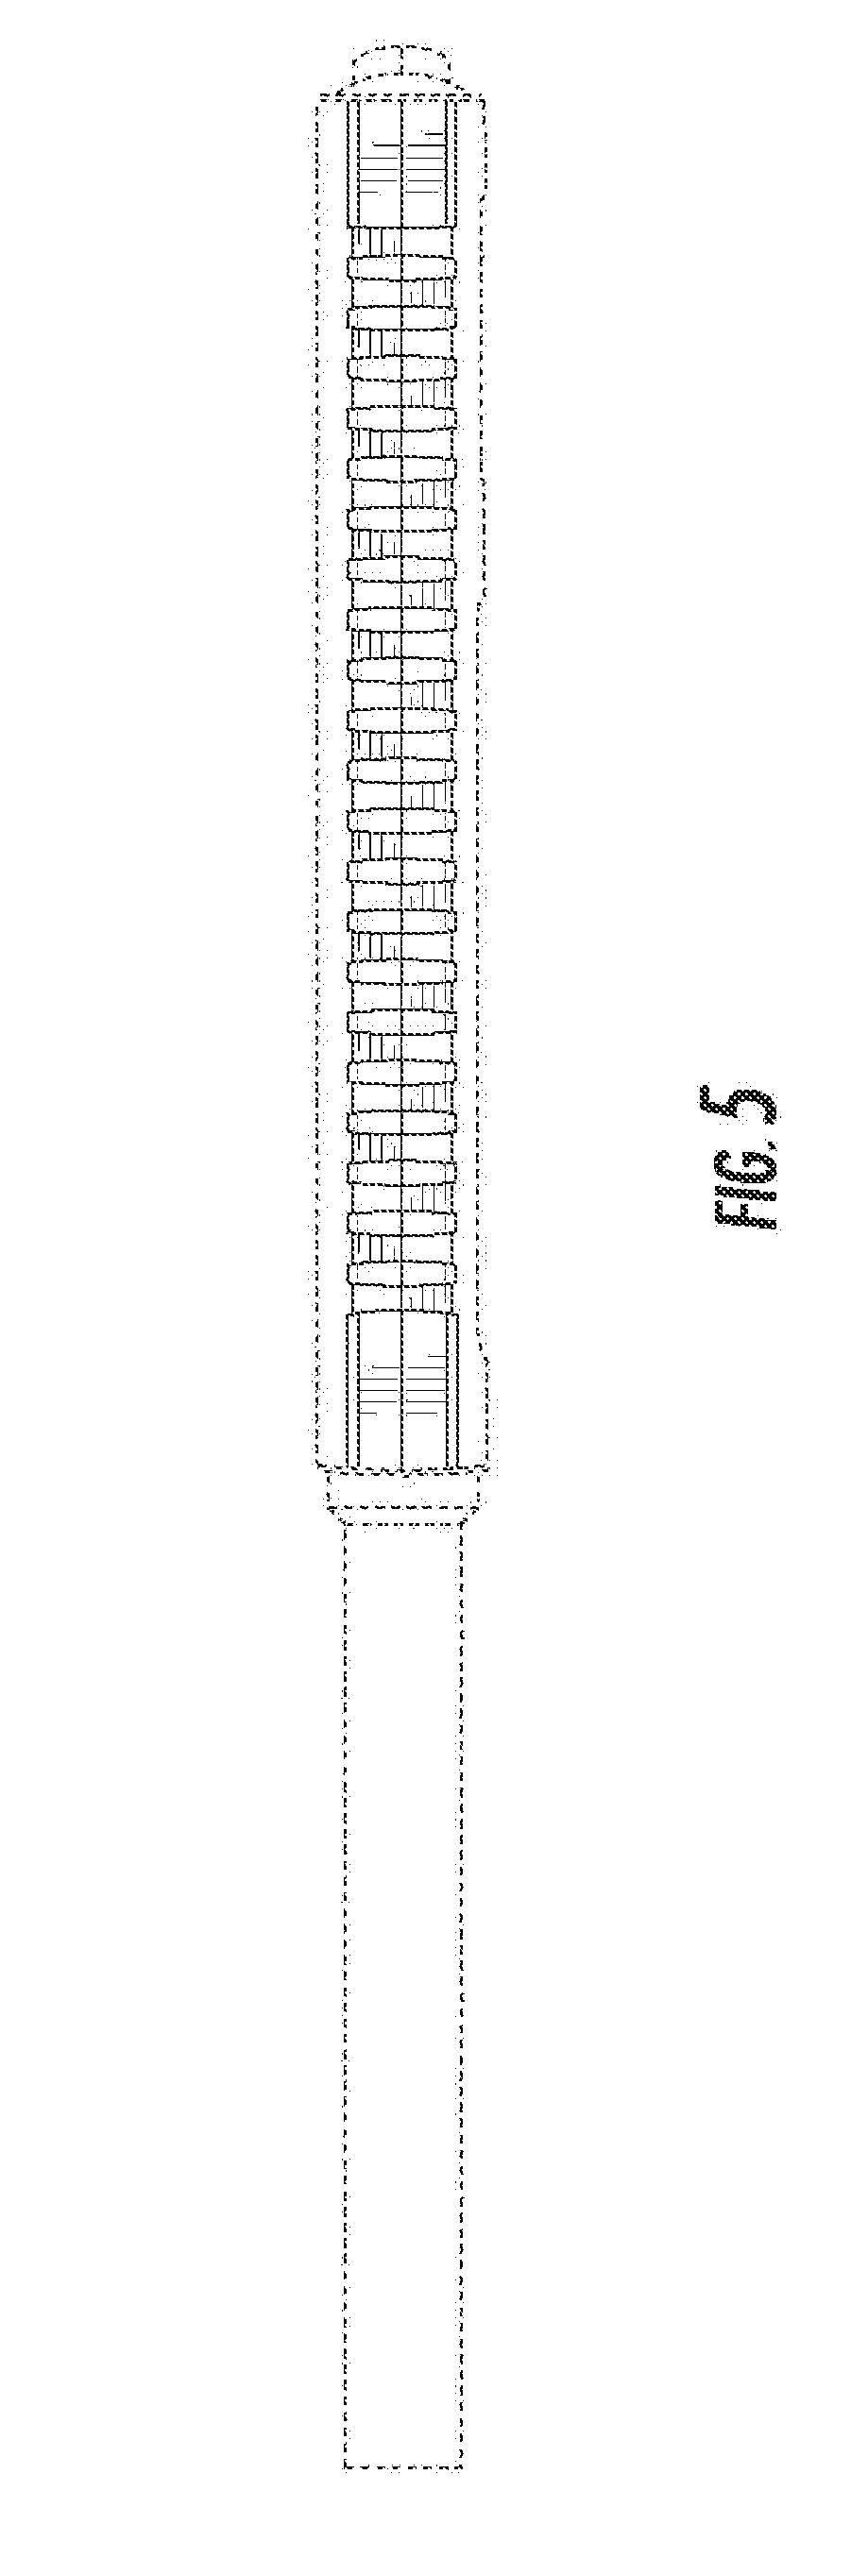 Patent D587766S1